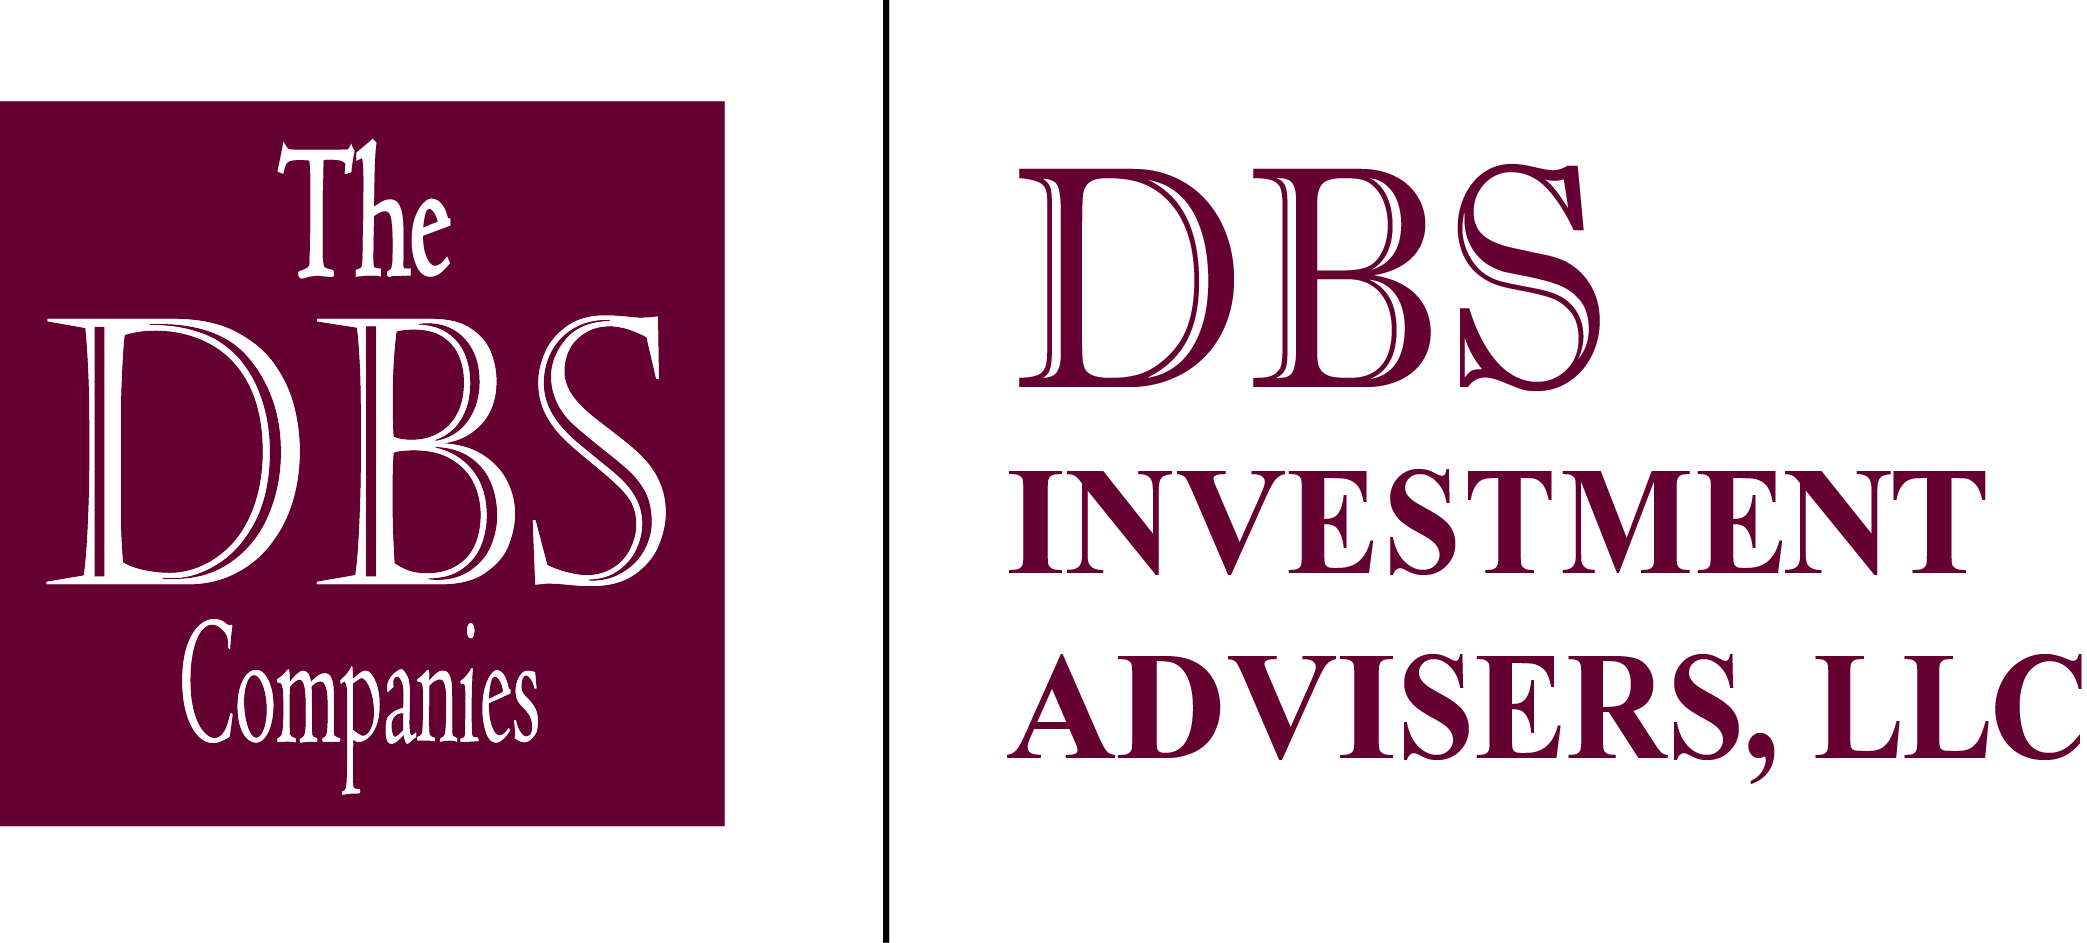 DBS Investment Advisers, LLC